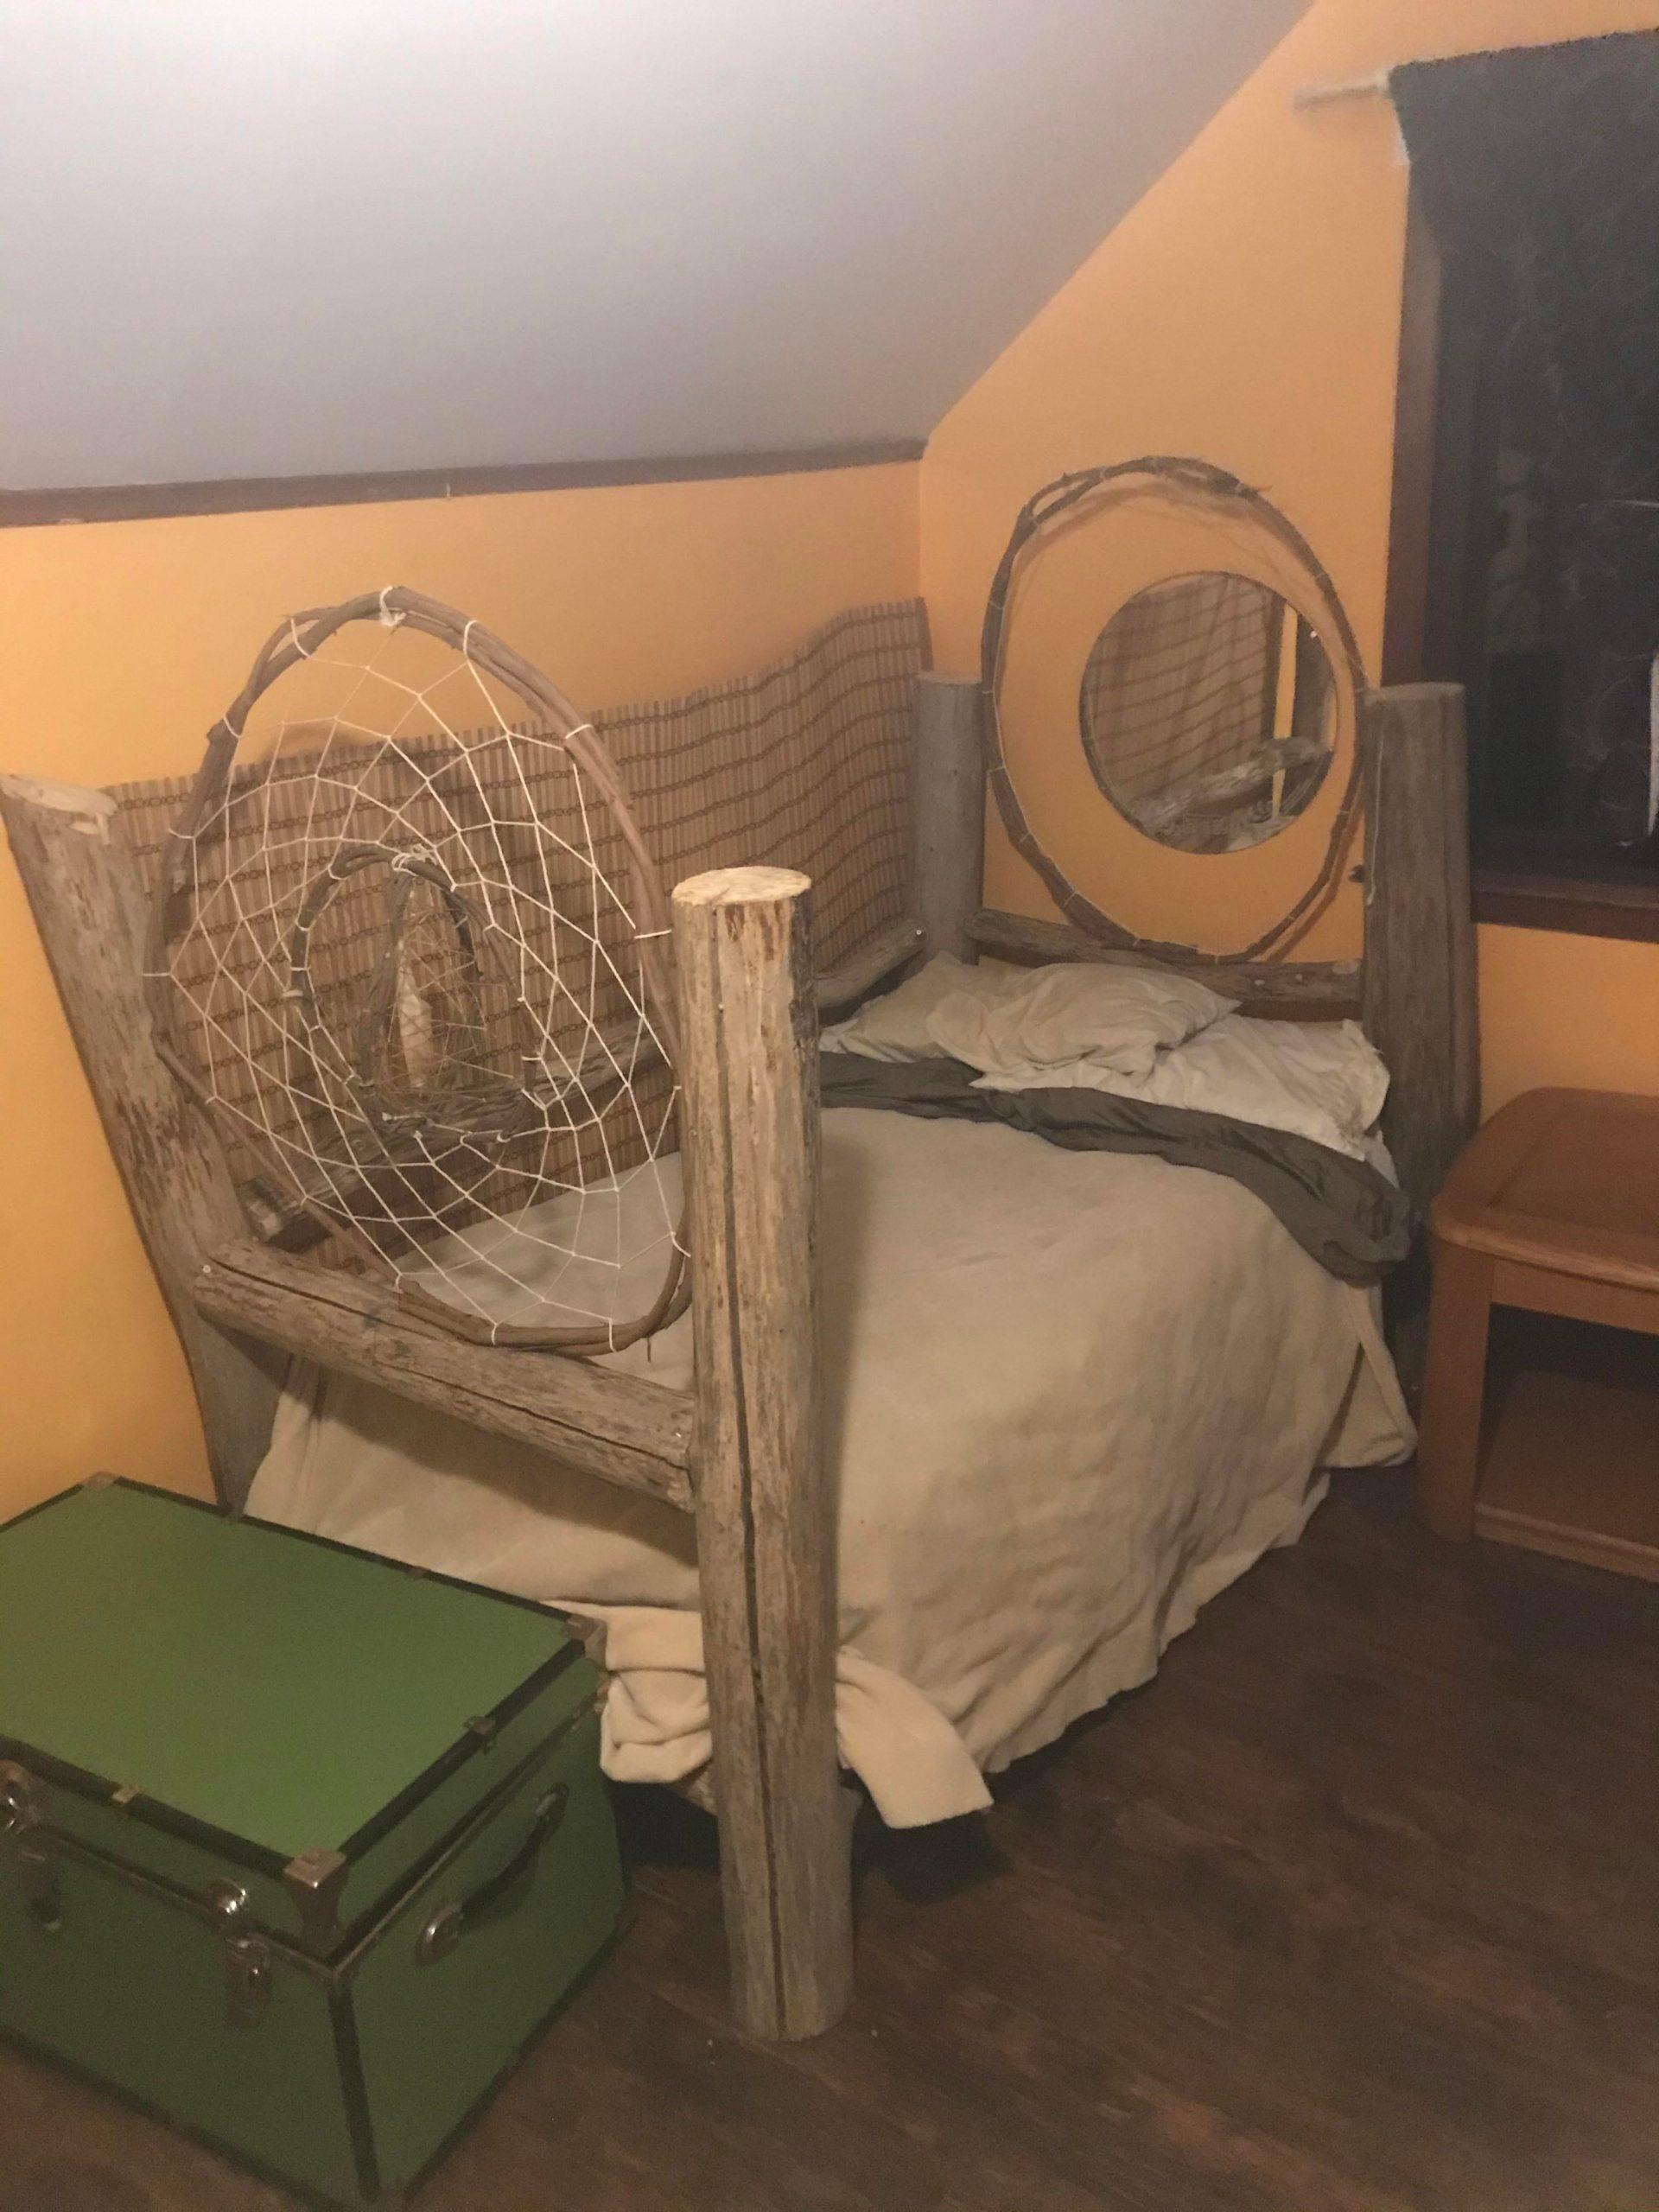 0j1um9j1nrt51 scaled - Finally made my son a bed! - hobbies, crafts